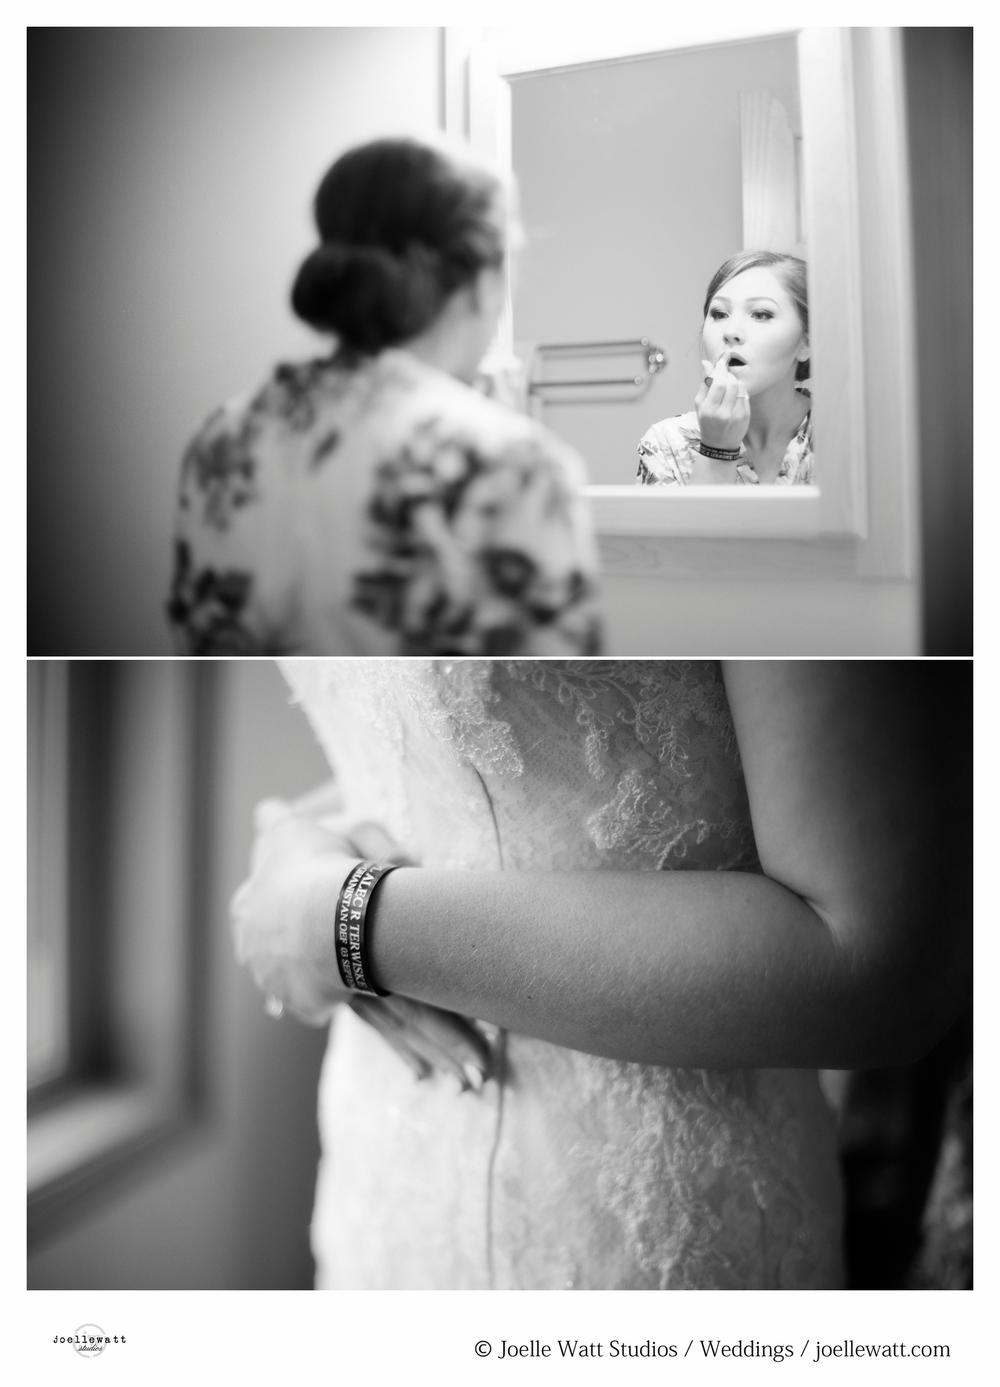 Terwiske Wedding 2.jpg